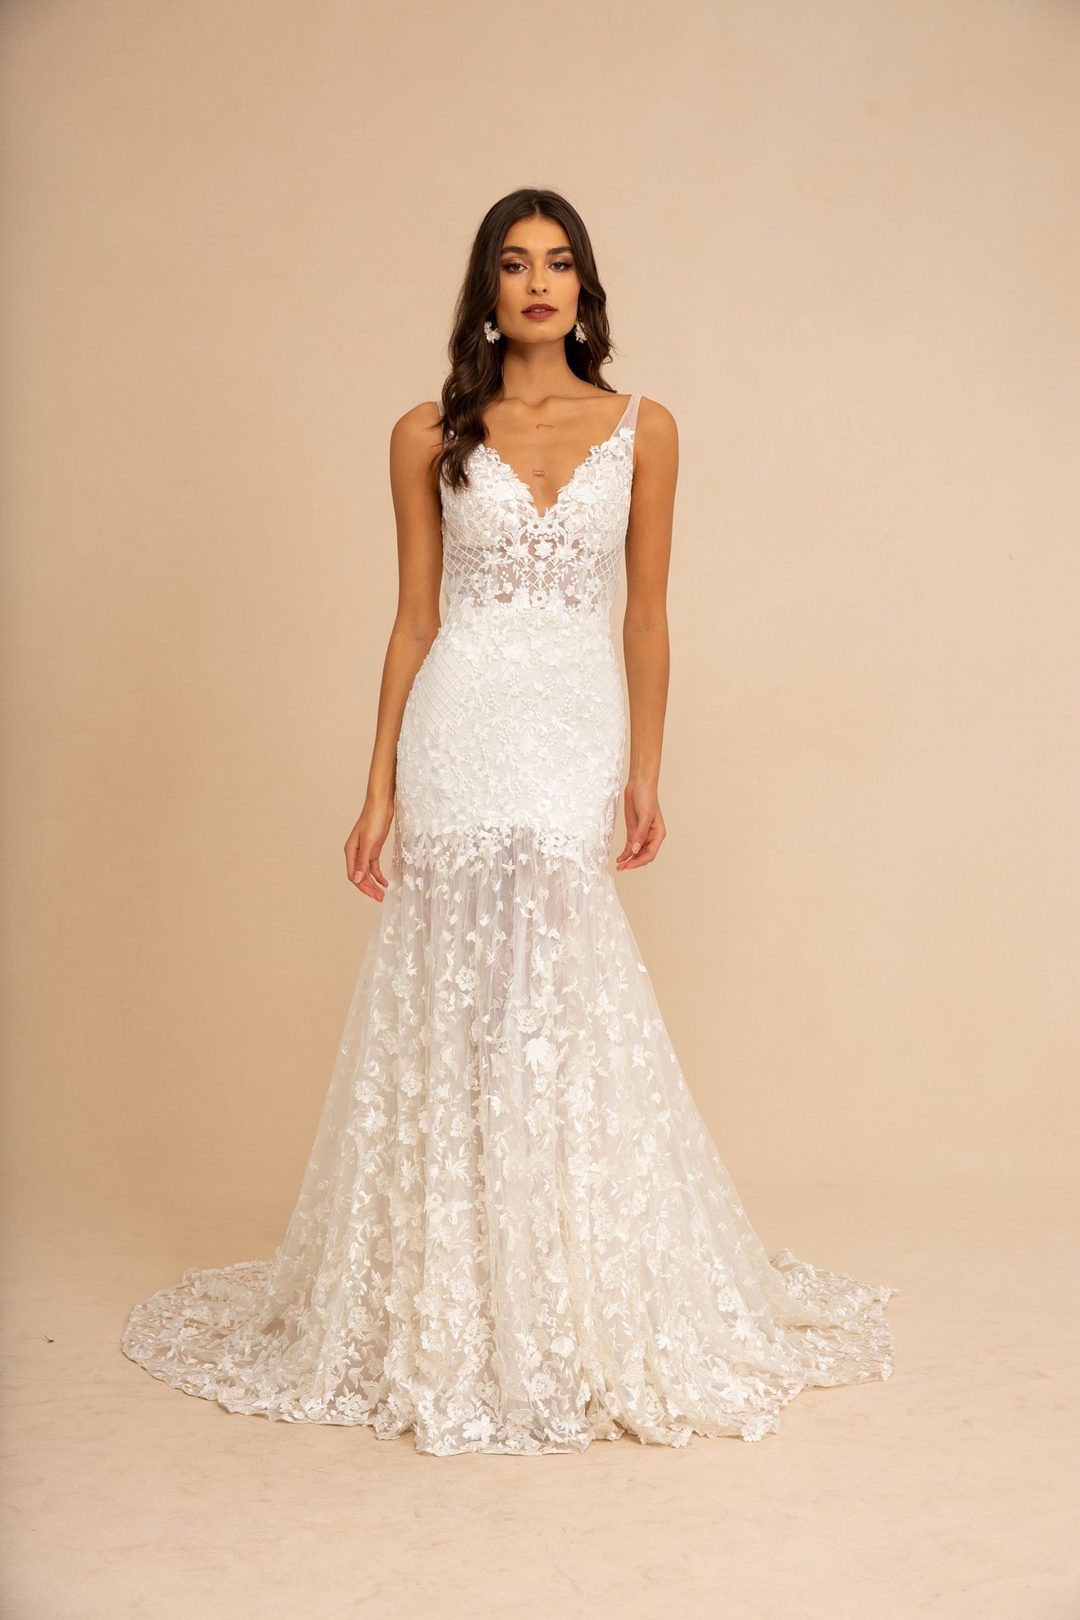 Dress main 2x 1548937449